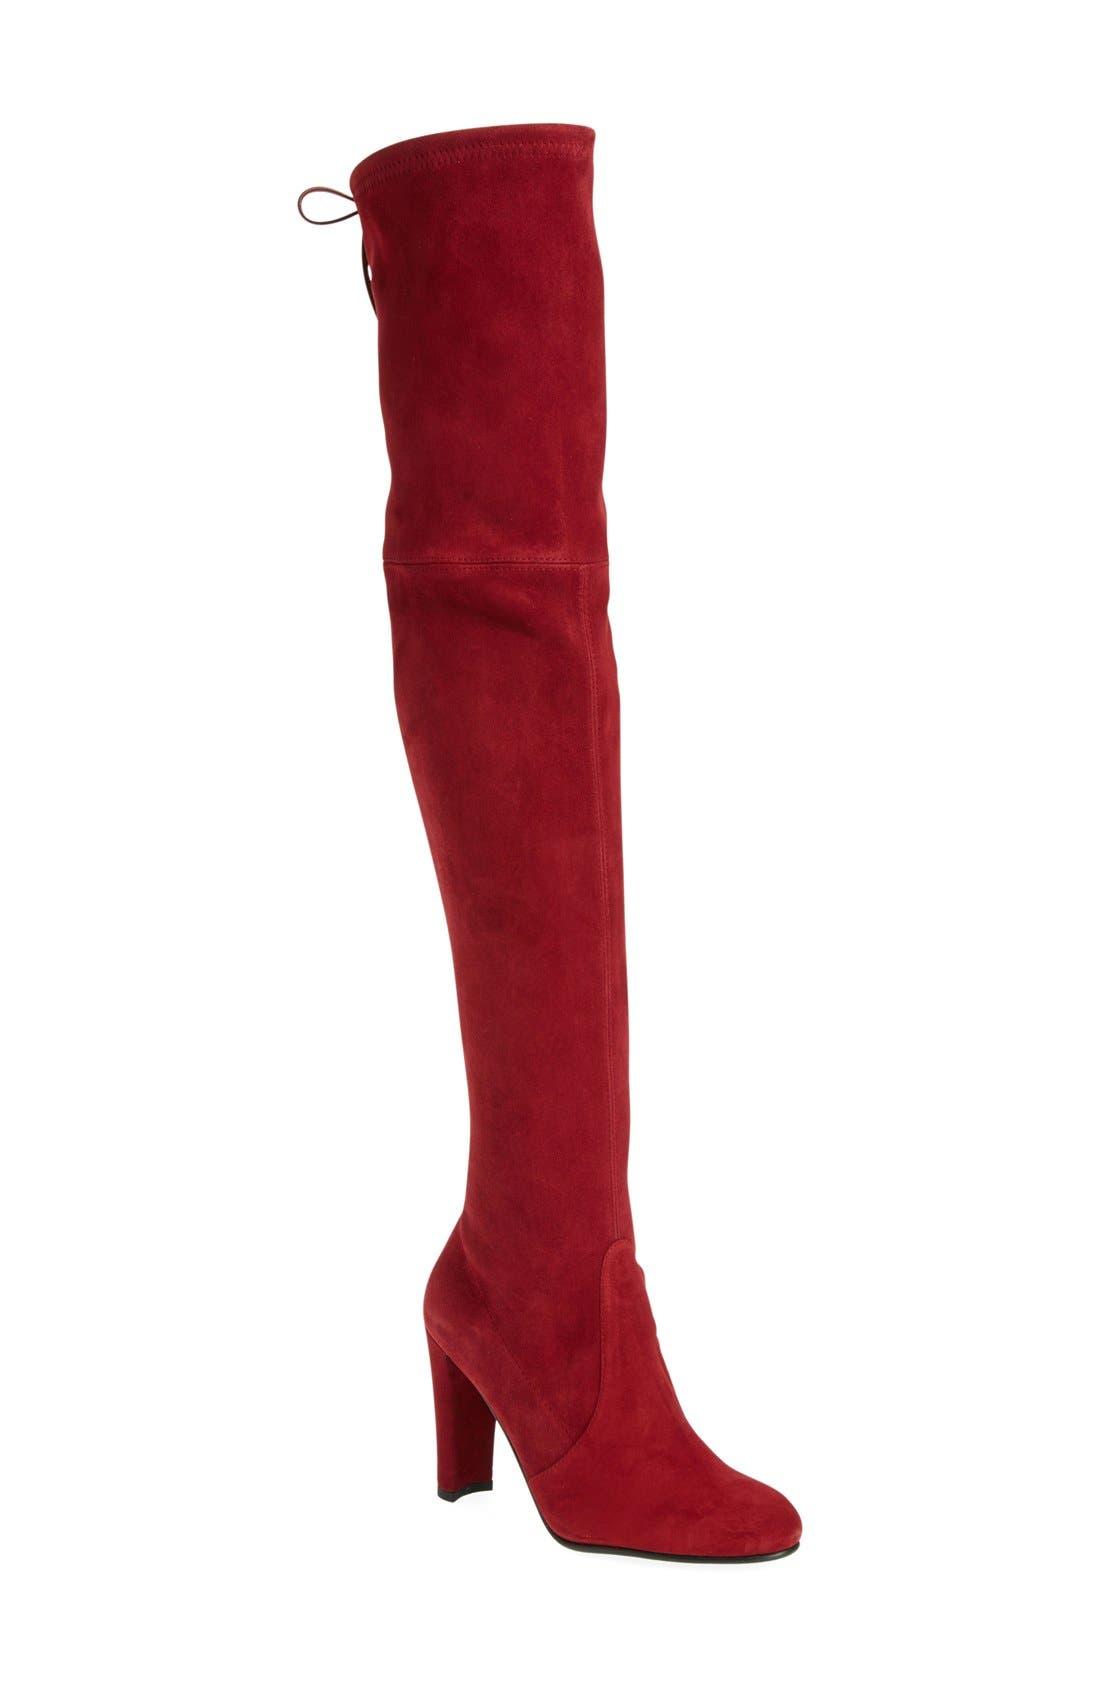 Main Image - Stuart Weitzman 'Highland' Over the Knee Boot (Women)